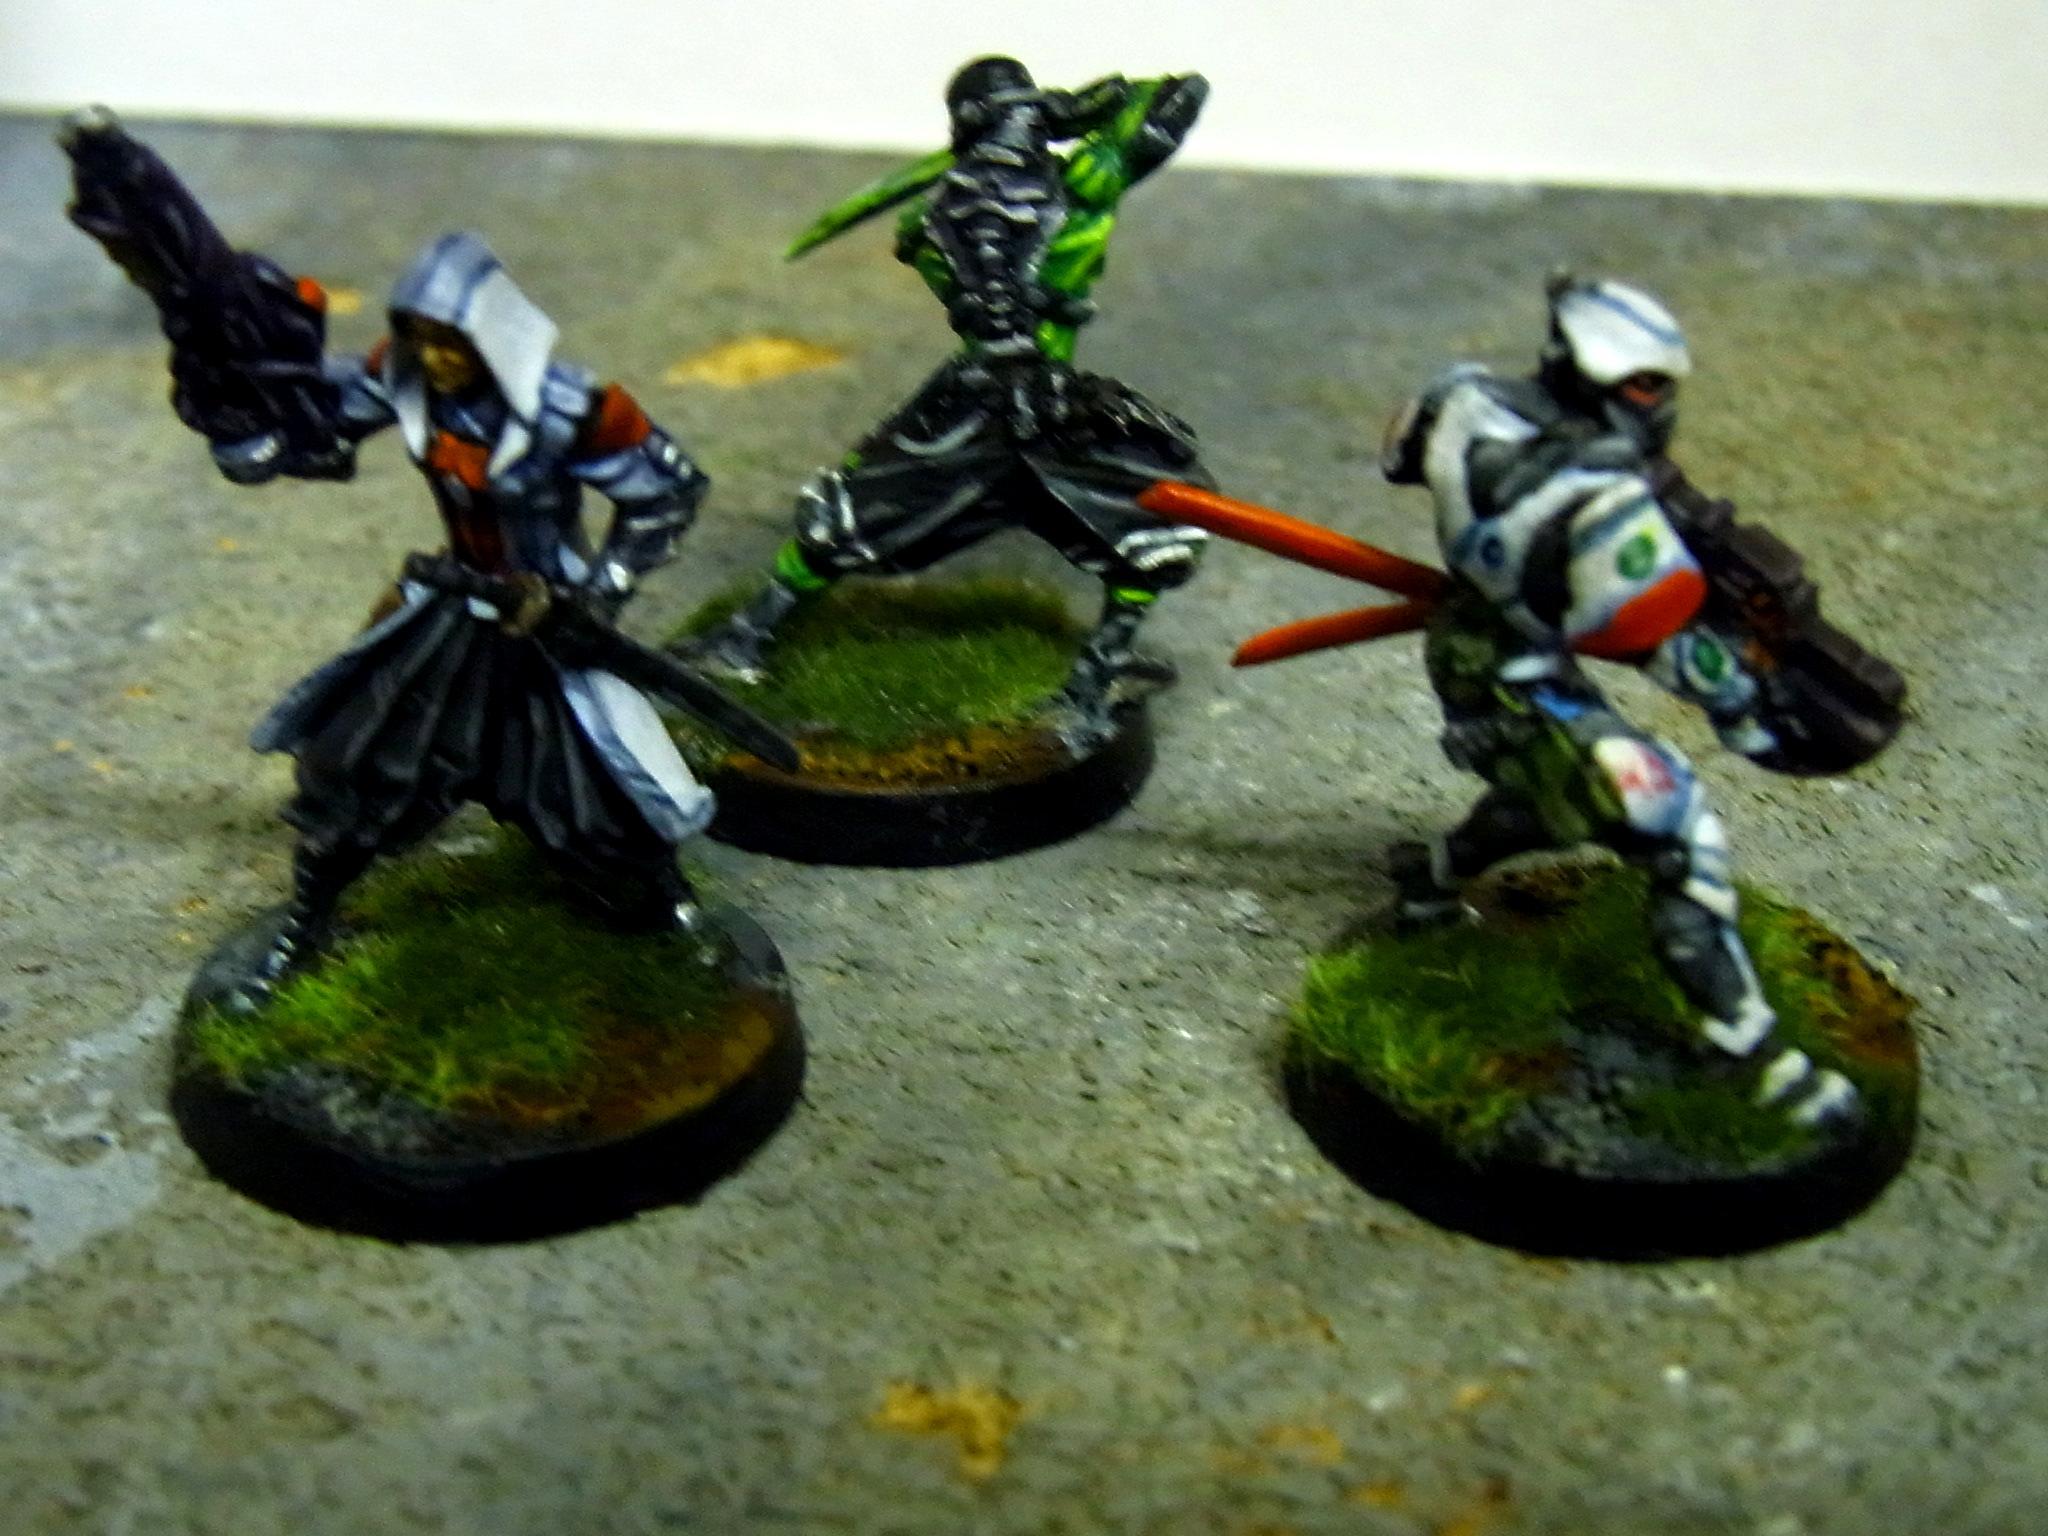 Domaru Butai, Infinity The Game, Infinty, Japanese Sectorial Army, Jsa, Kempeitai, Oniwaban, Yu-jing